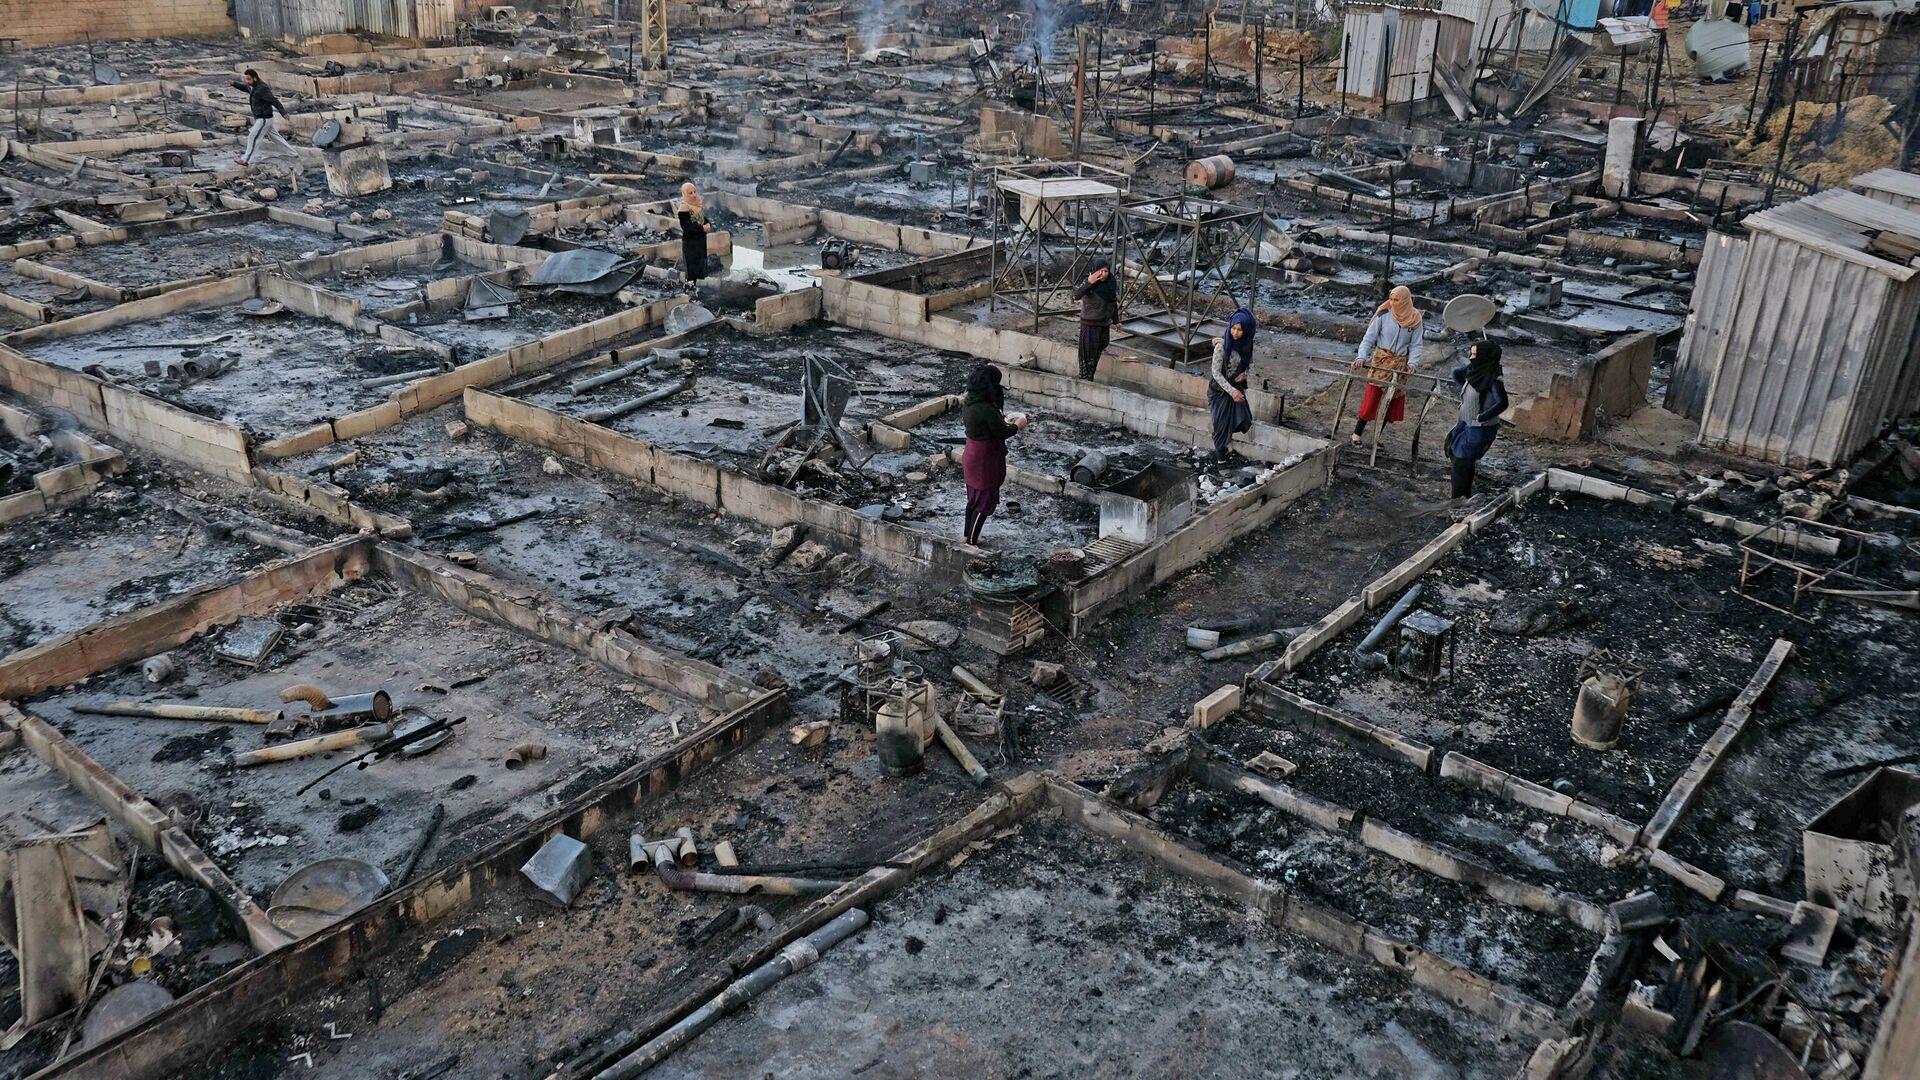 Flüchtlingslager im Libanon in Brand gesetzt - SNA, 1920, 27.12.2020